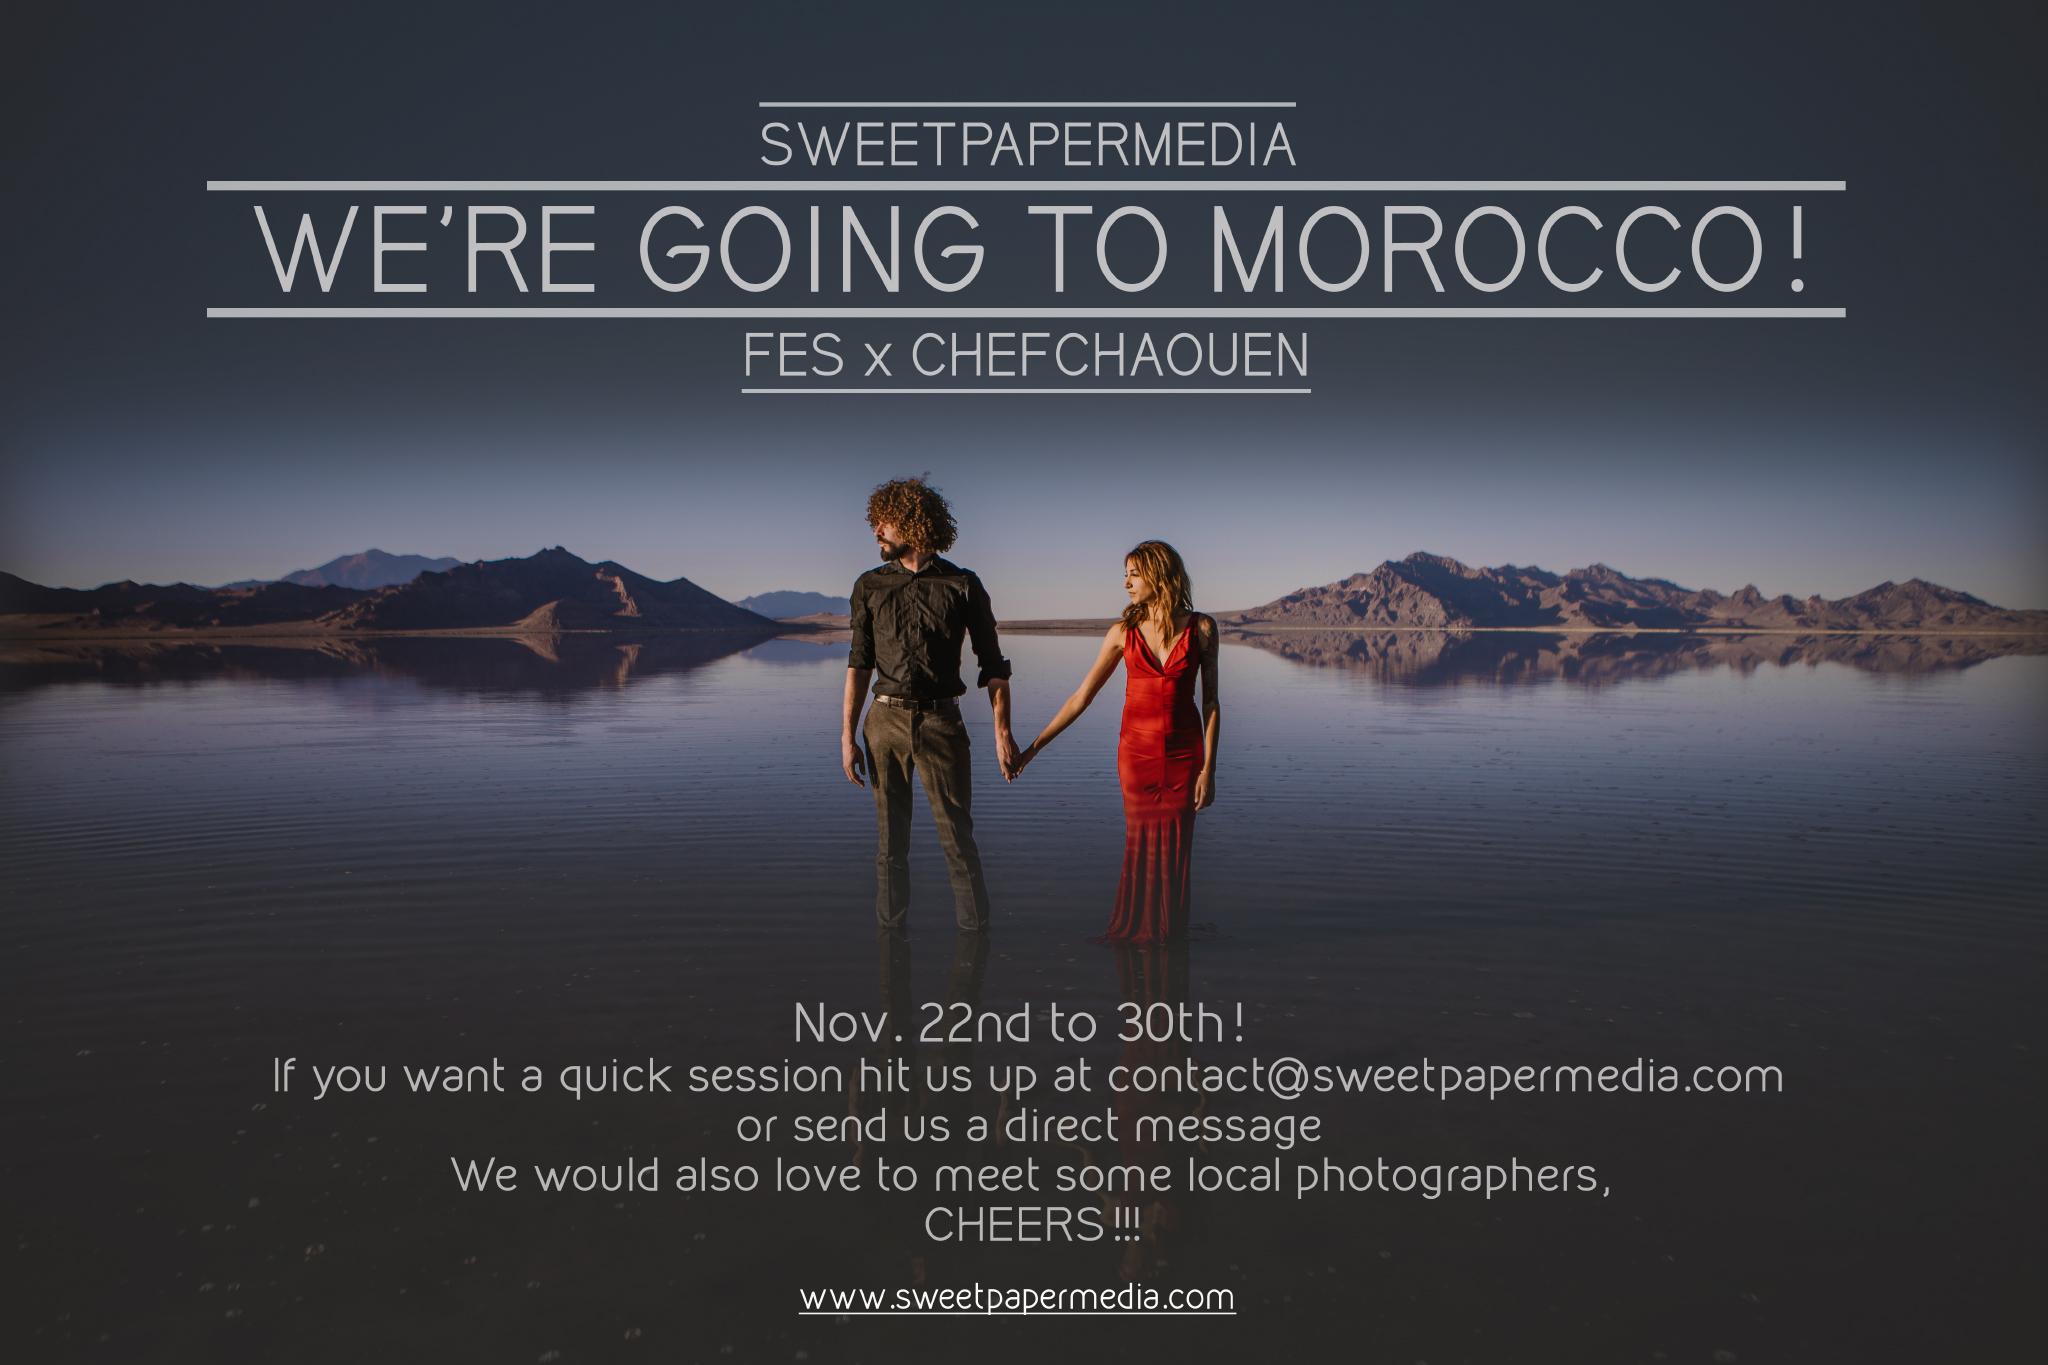 Let's shoot in Morocco!